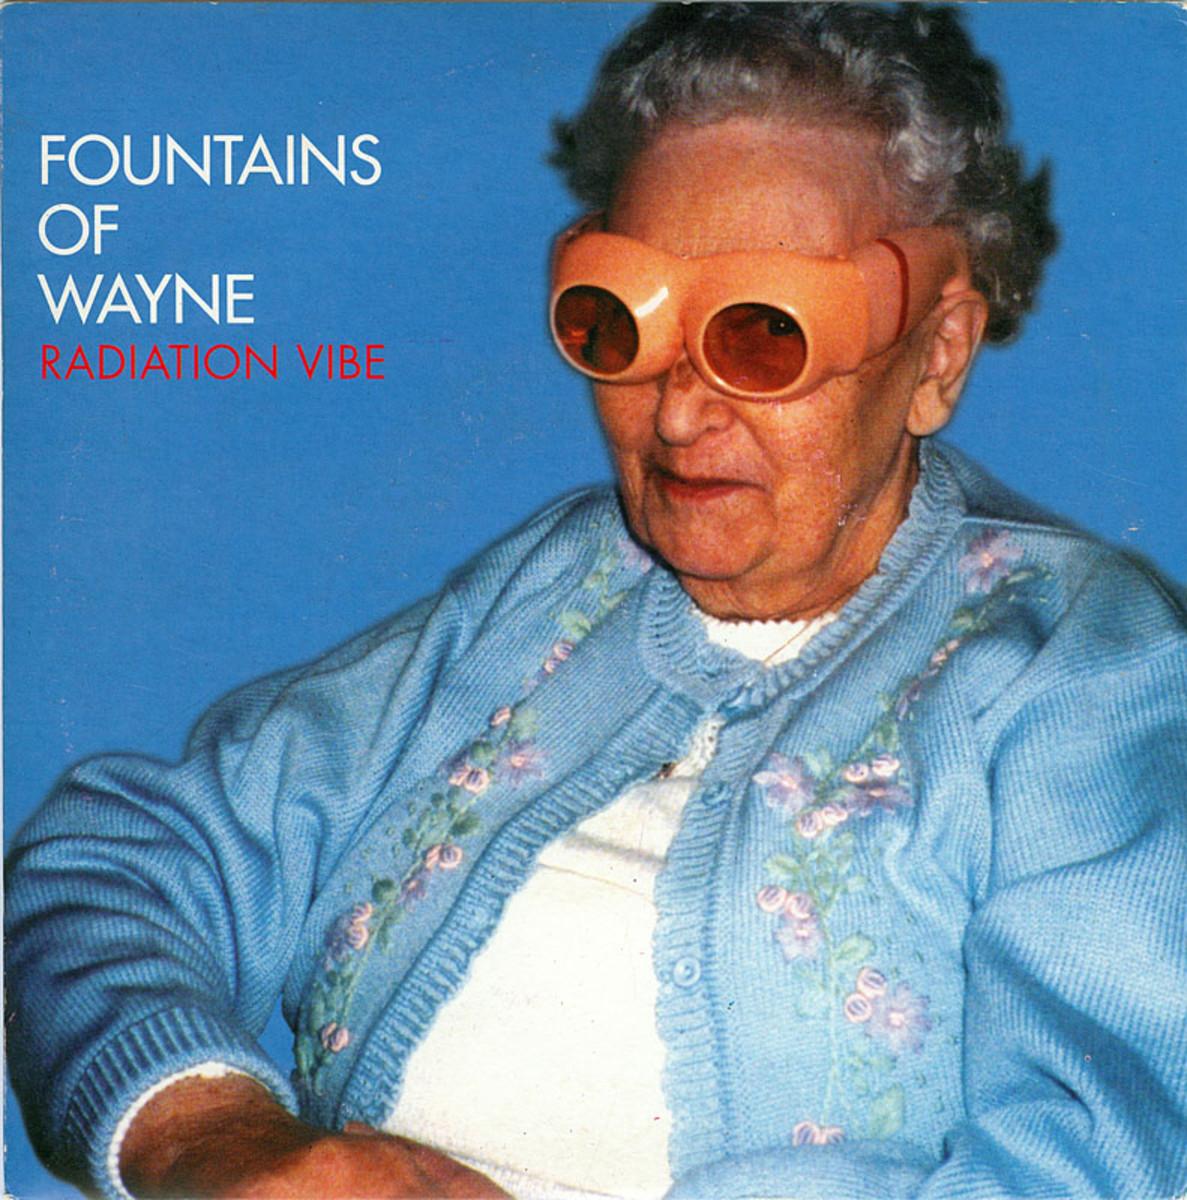 fountains-of-wayne-radiation-vibe-atlantic